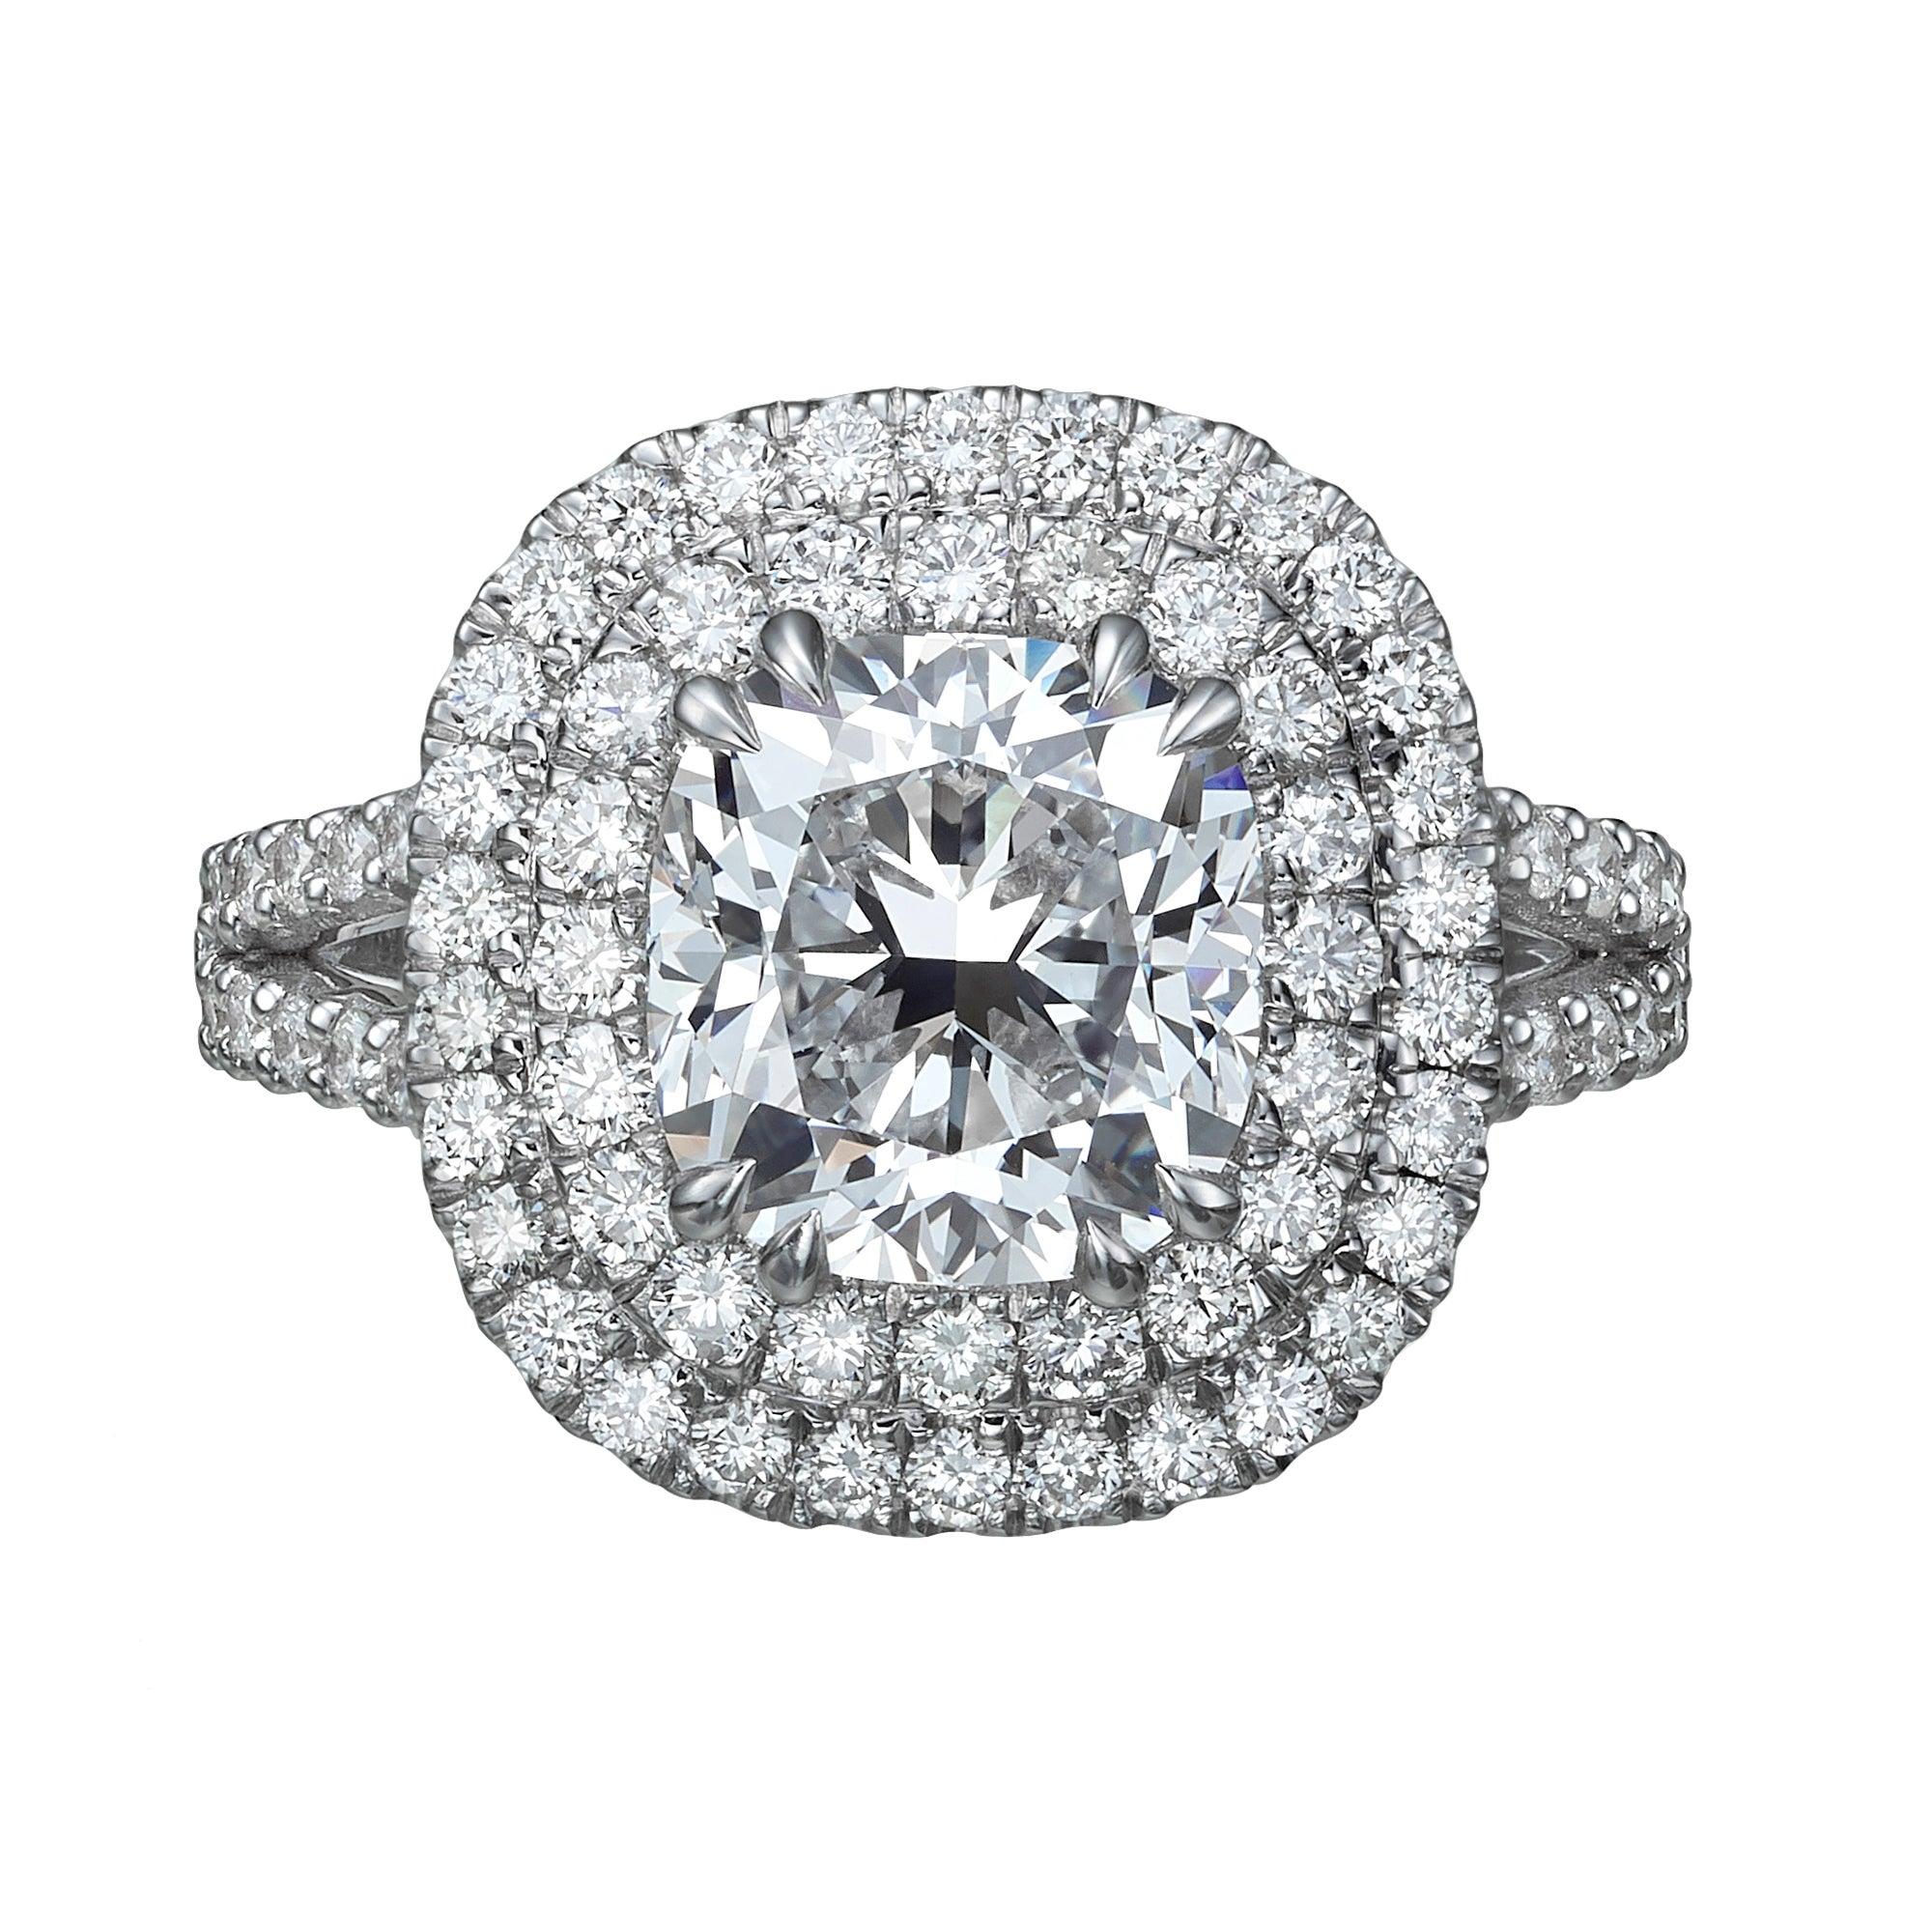 GIA Certified  3.28 Carat Cushion Cut Diamond Halo Engagement Ring E / VS1